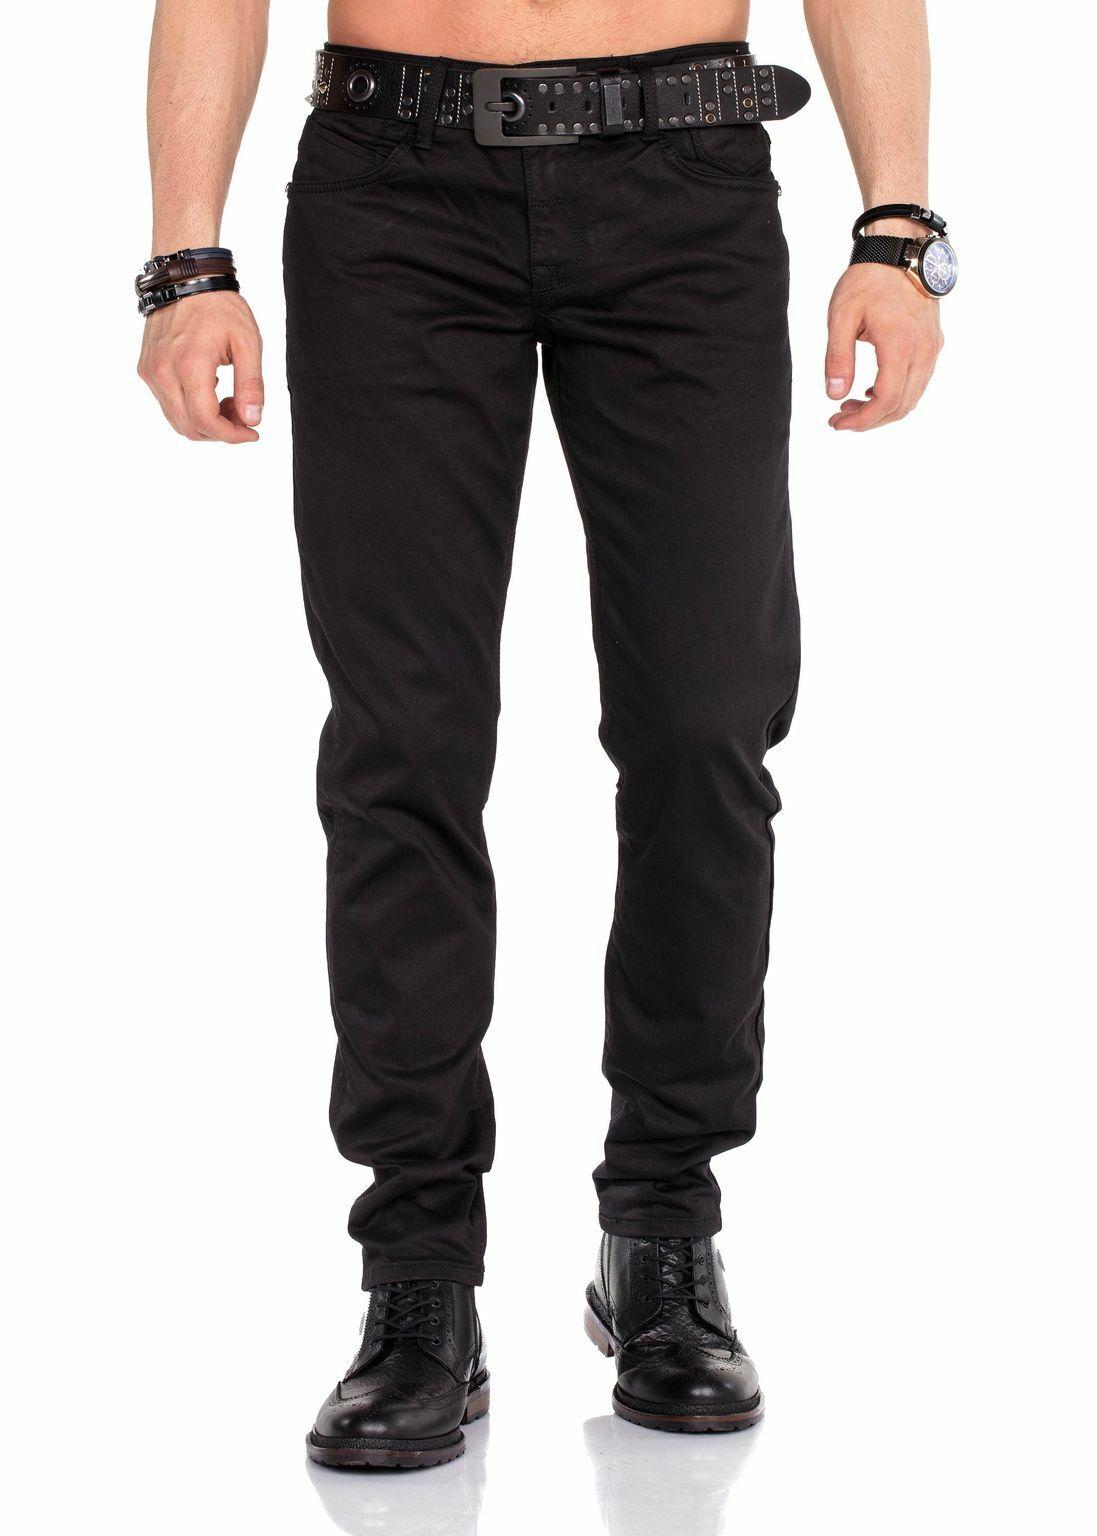 CIPO & BAXX Herren Jeans Hose CD412 schwarz Slim Slim Slim Fit 52bce7